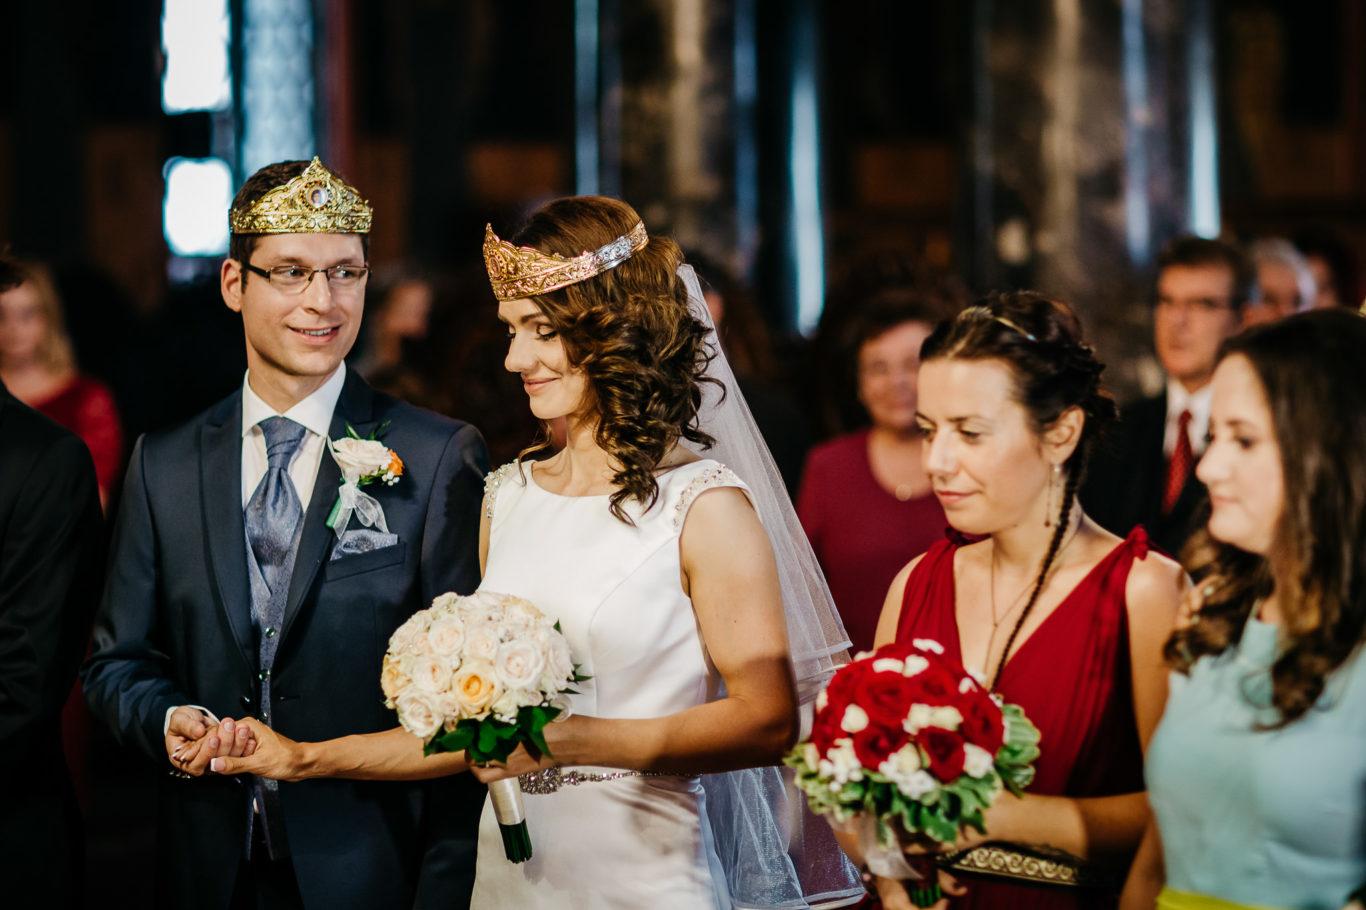 0473-fotografie-nunta-bucuresti-dana-radu-fotograf-ciprian-dumitrescu-cd2_7456